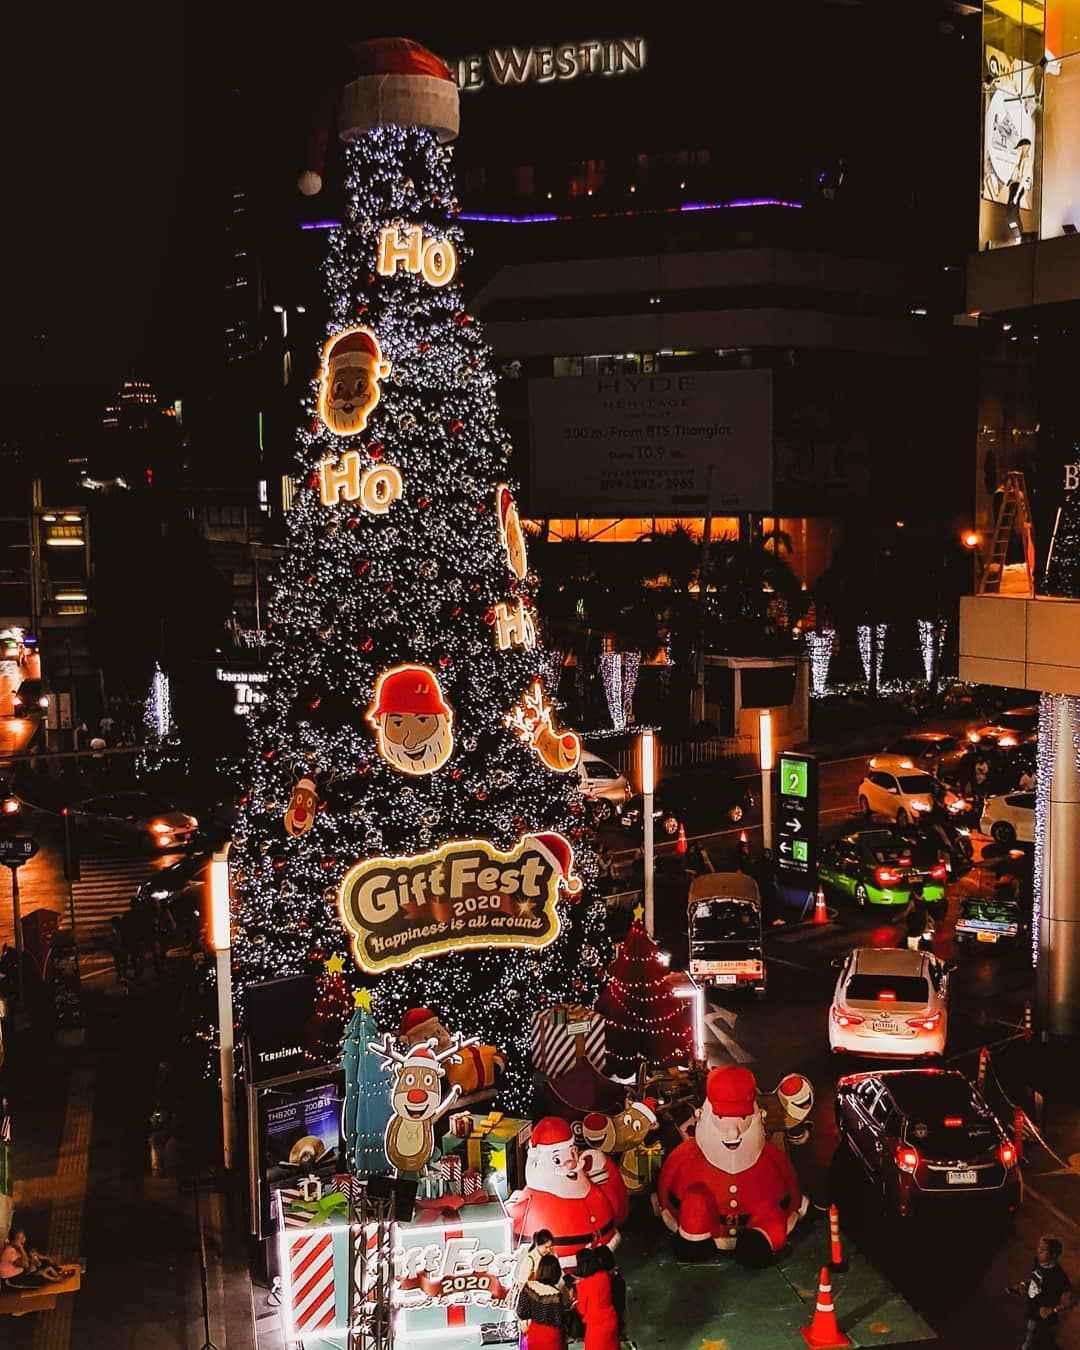 GiftFest Christmas tree at Terminal 21 in Bangkok